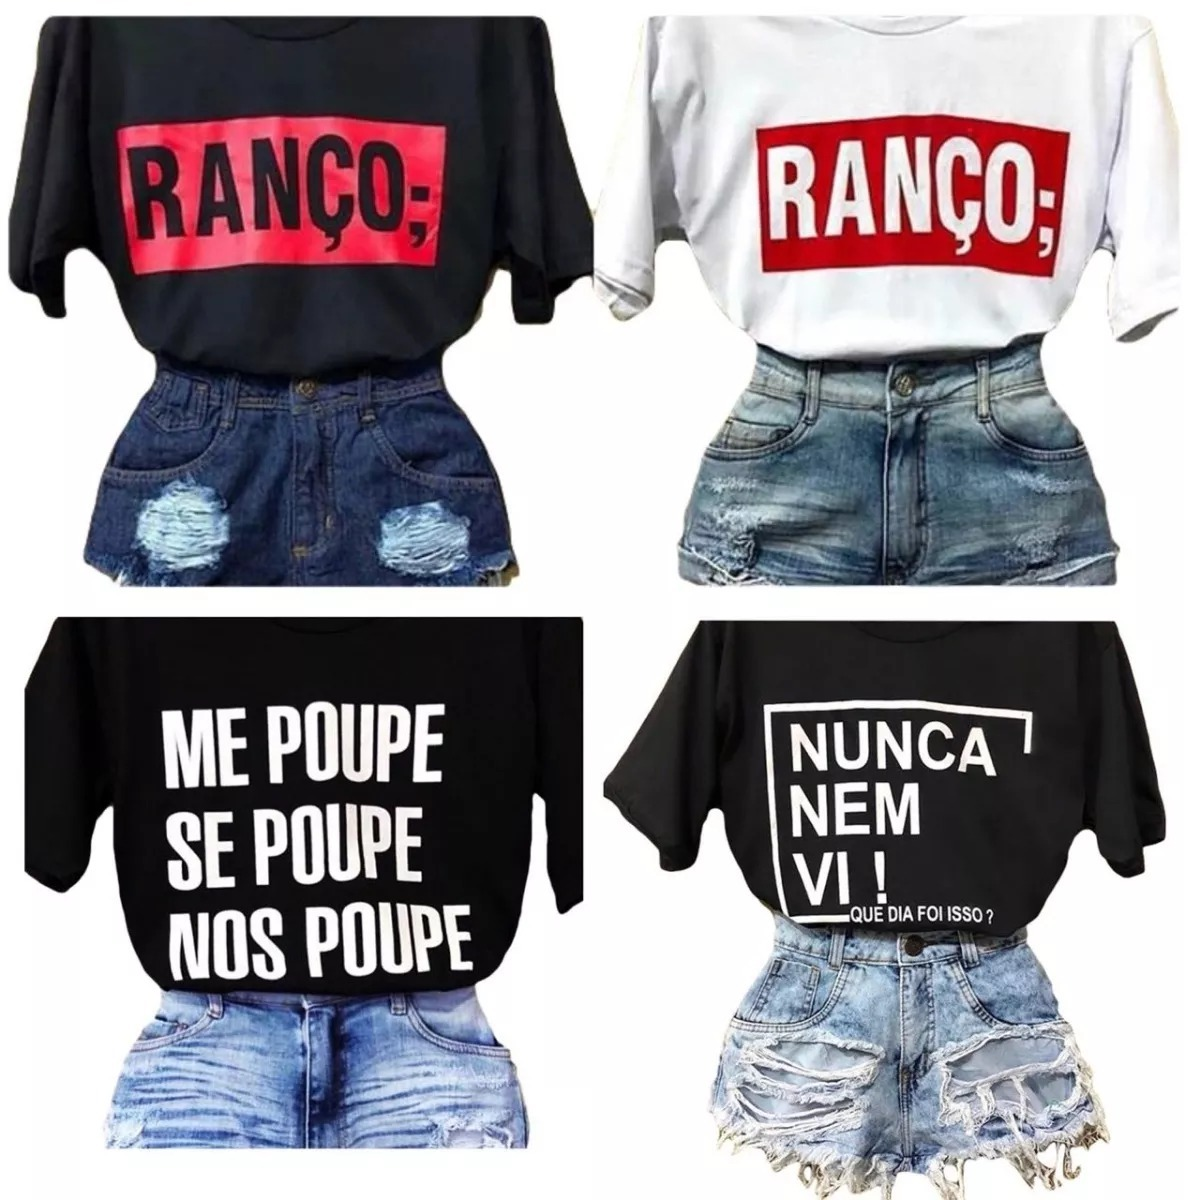 Camiseta Blusa Blusinha Ranço Embuste Fofa Grossa Plena2018 R 22